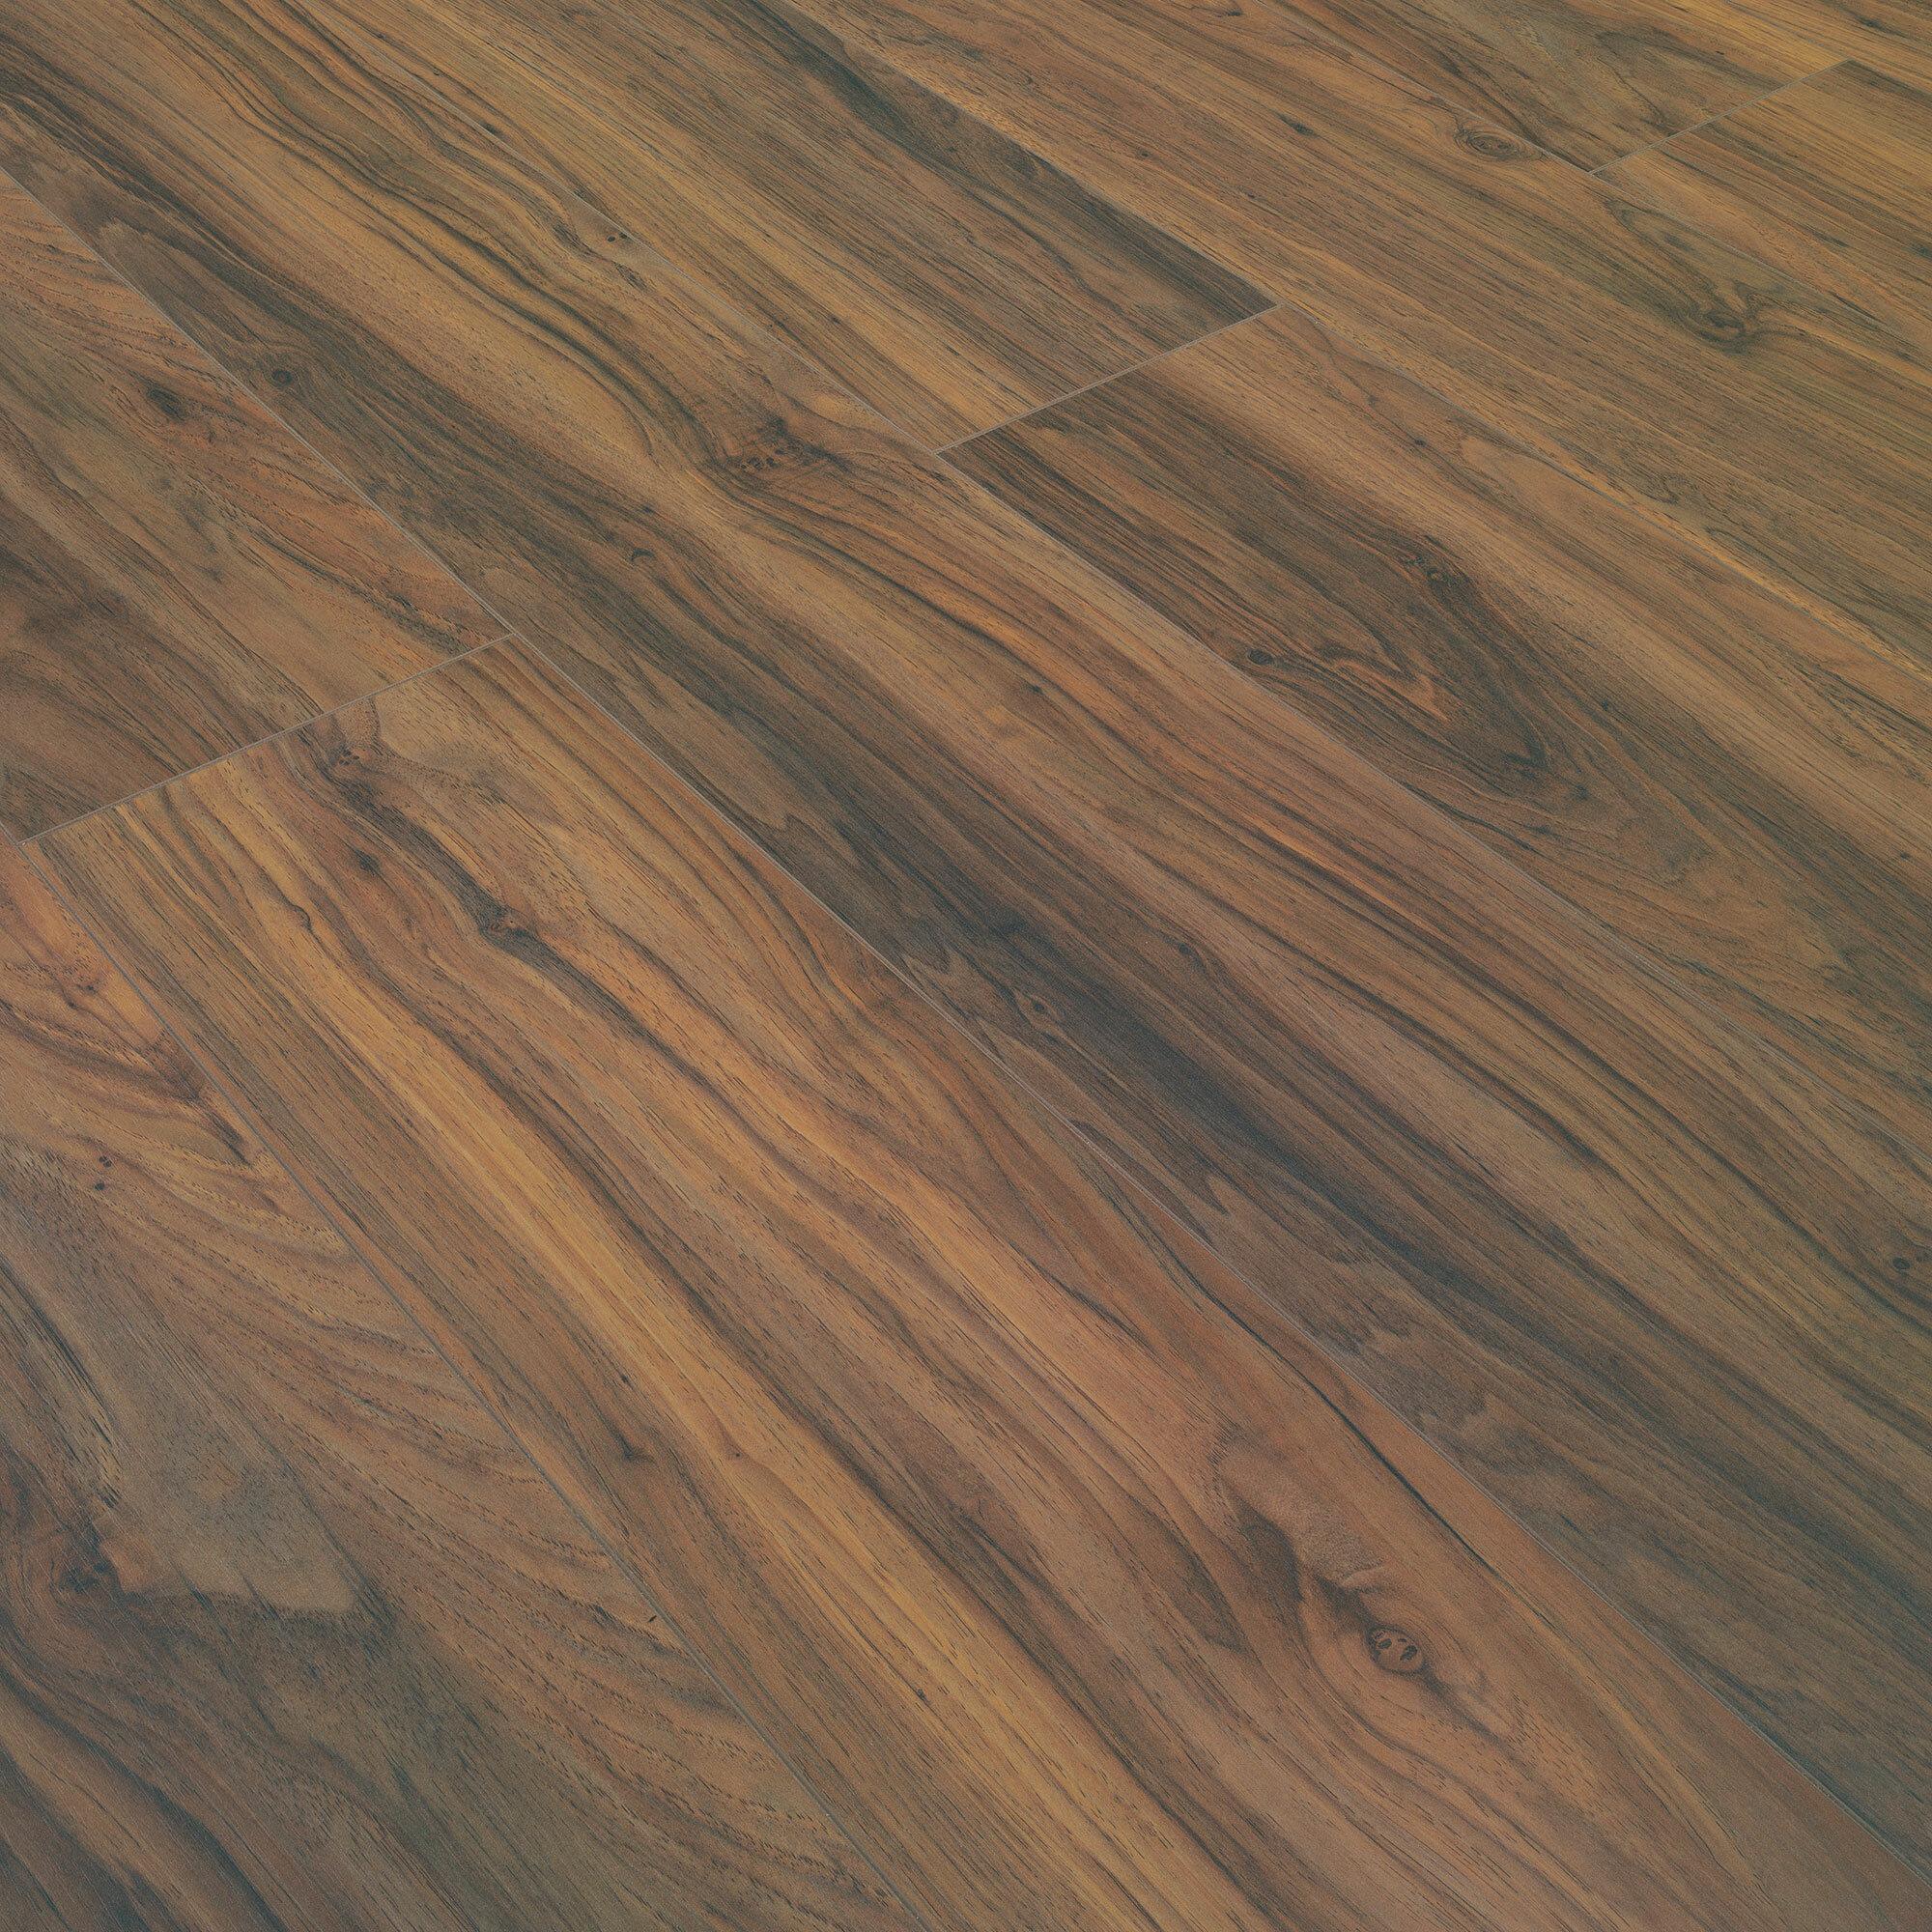 X 12mm Pine Laminate Flooring